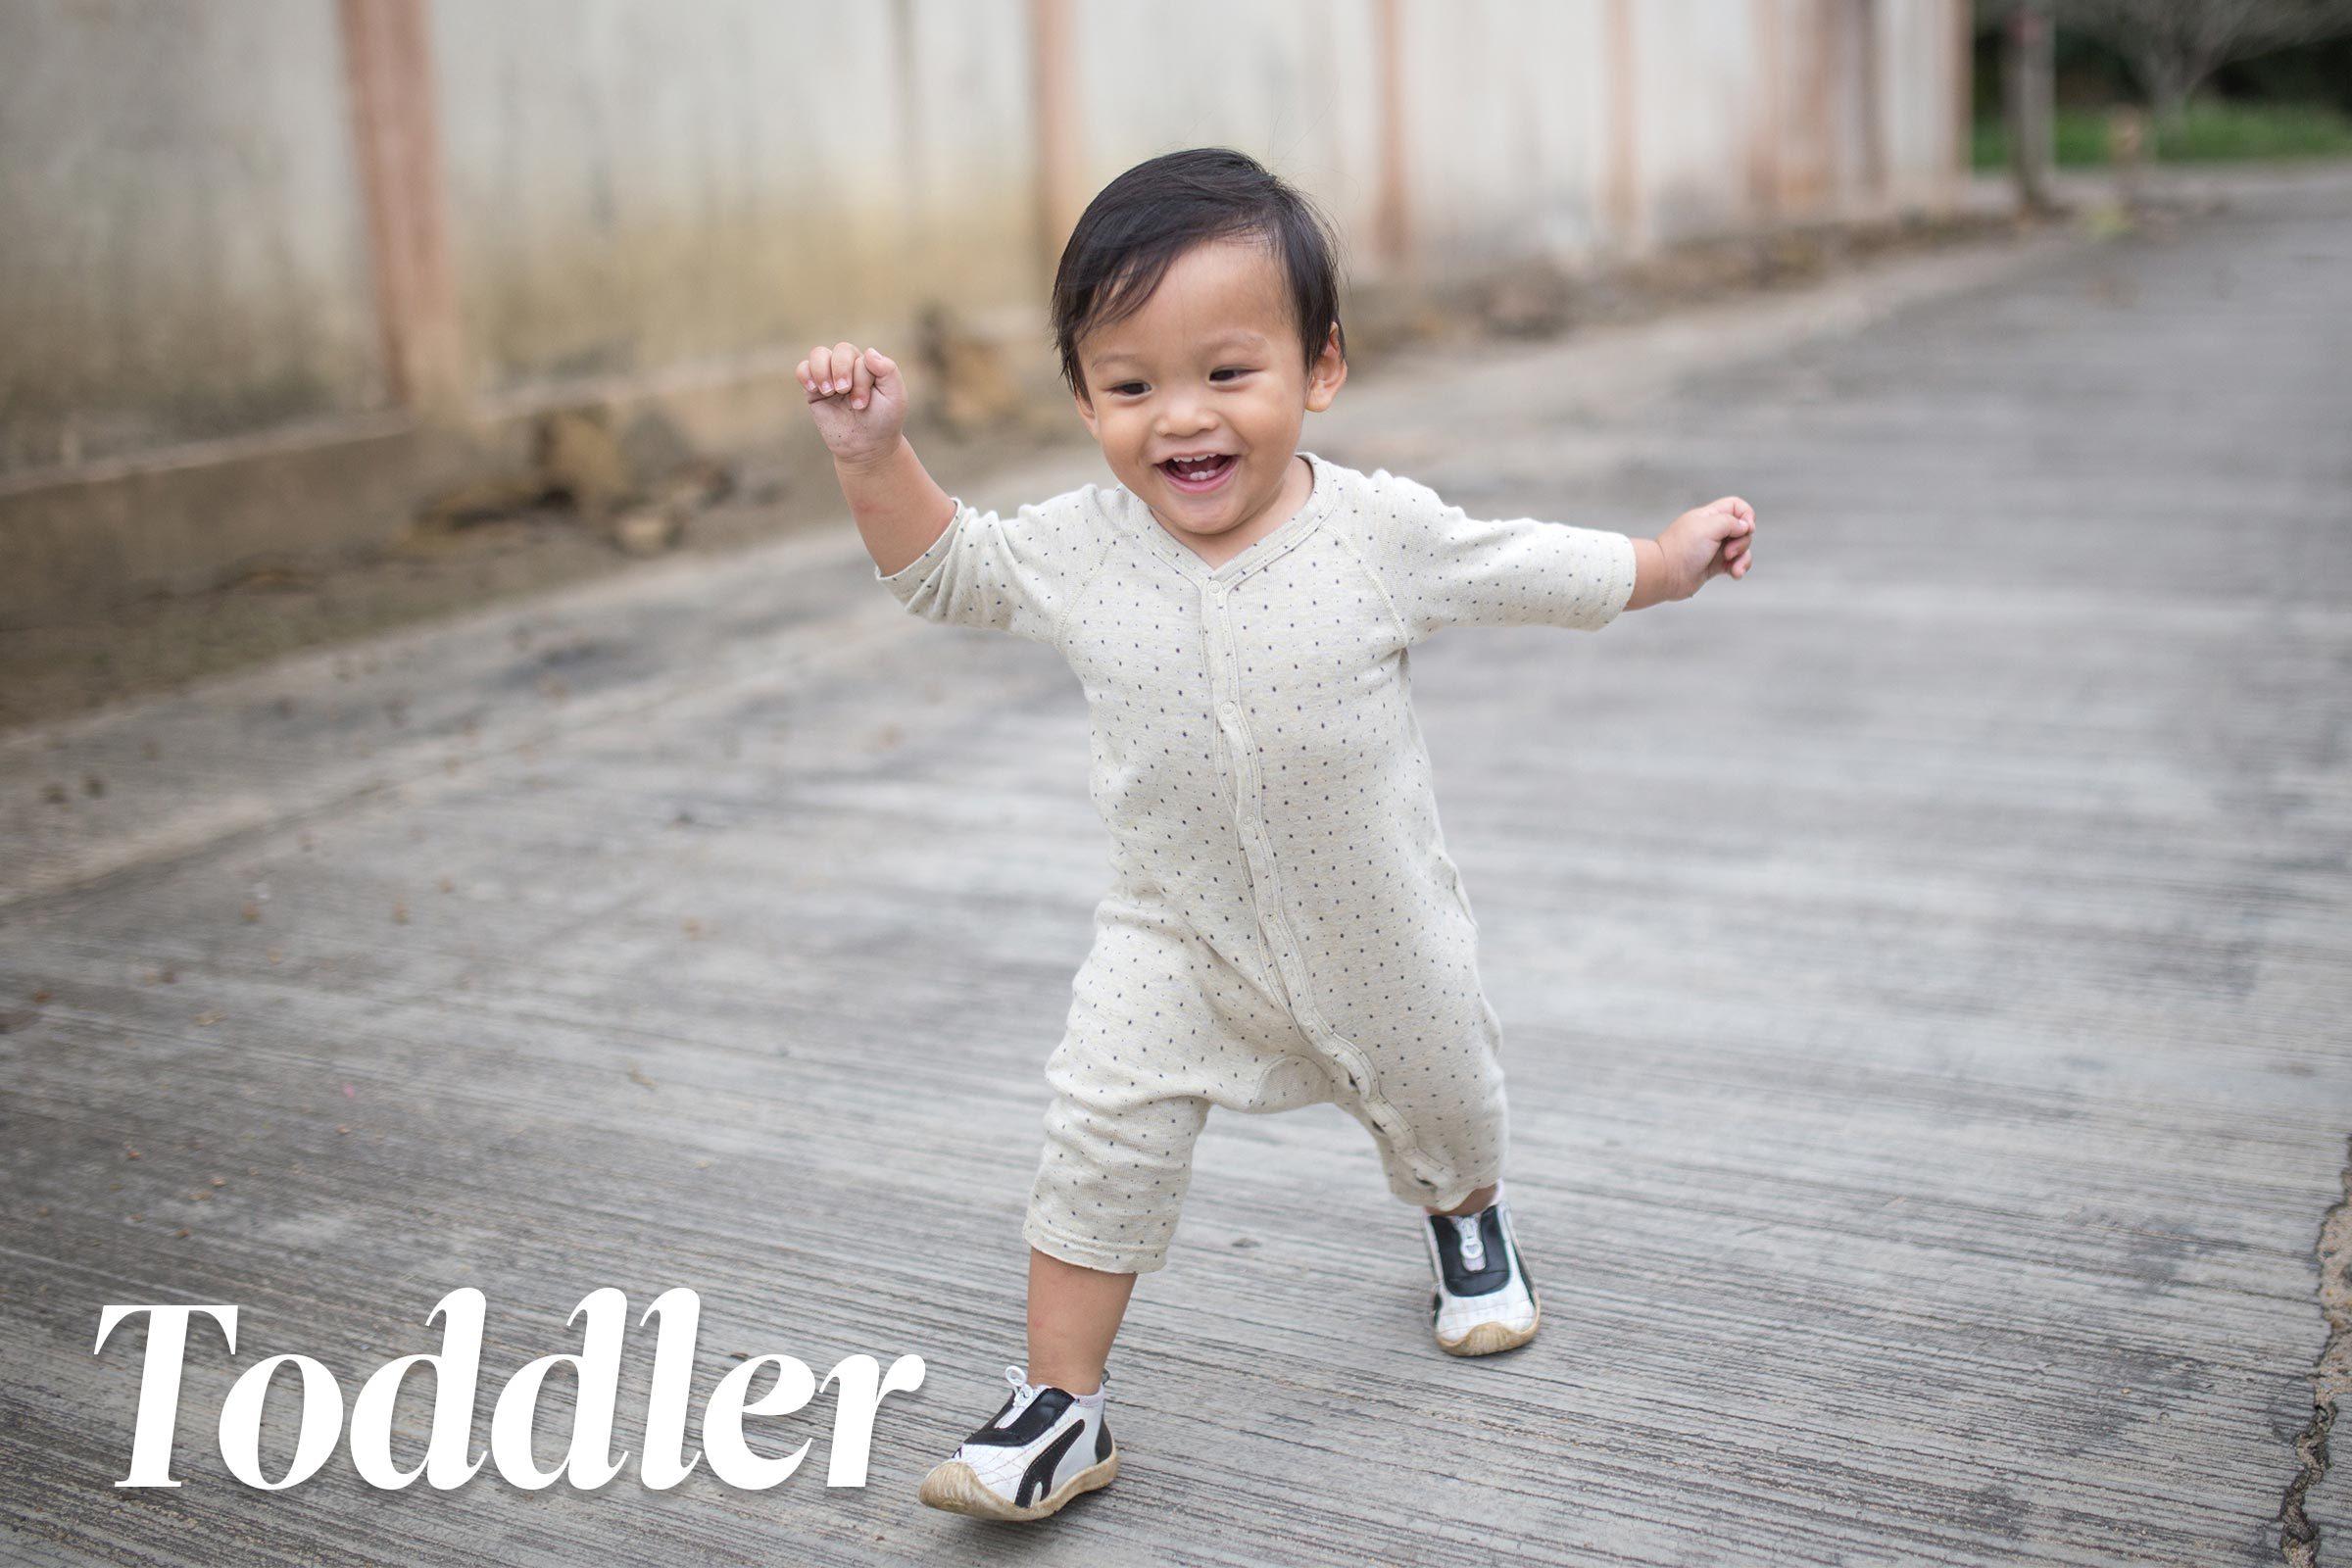 happy toddler running